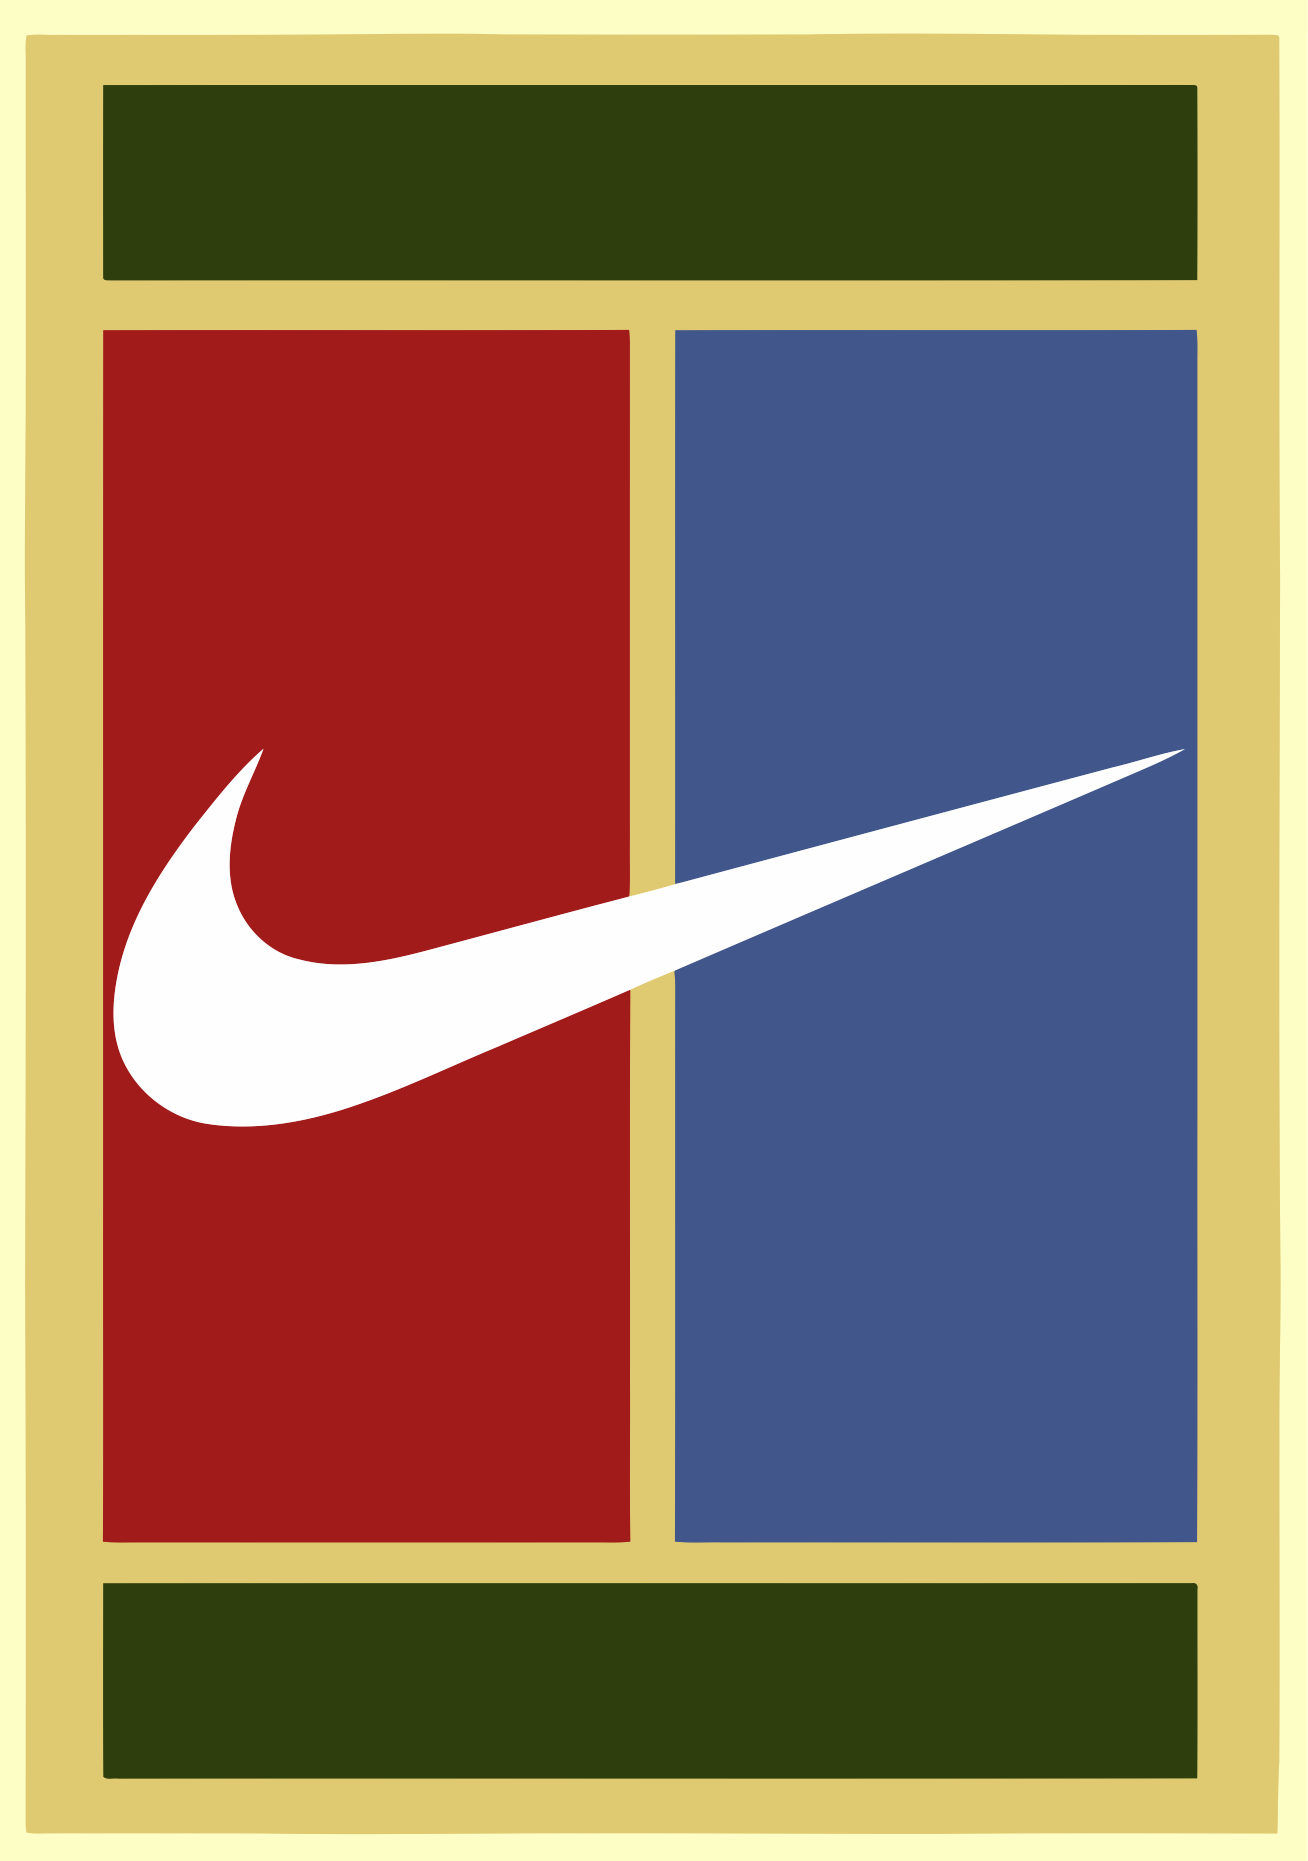 2 Two Nike Tennis Logo Vinyl Sticker Nadal Federer Sampras Agassi Us Open Fondos De Pantalla Del Telefono Fotos De Jesus Fondos Para Iphone